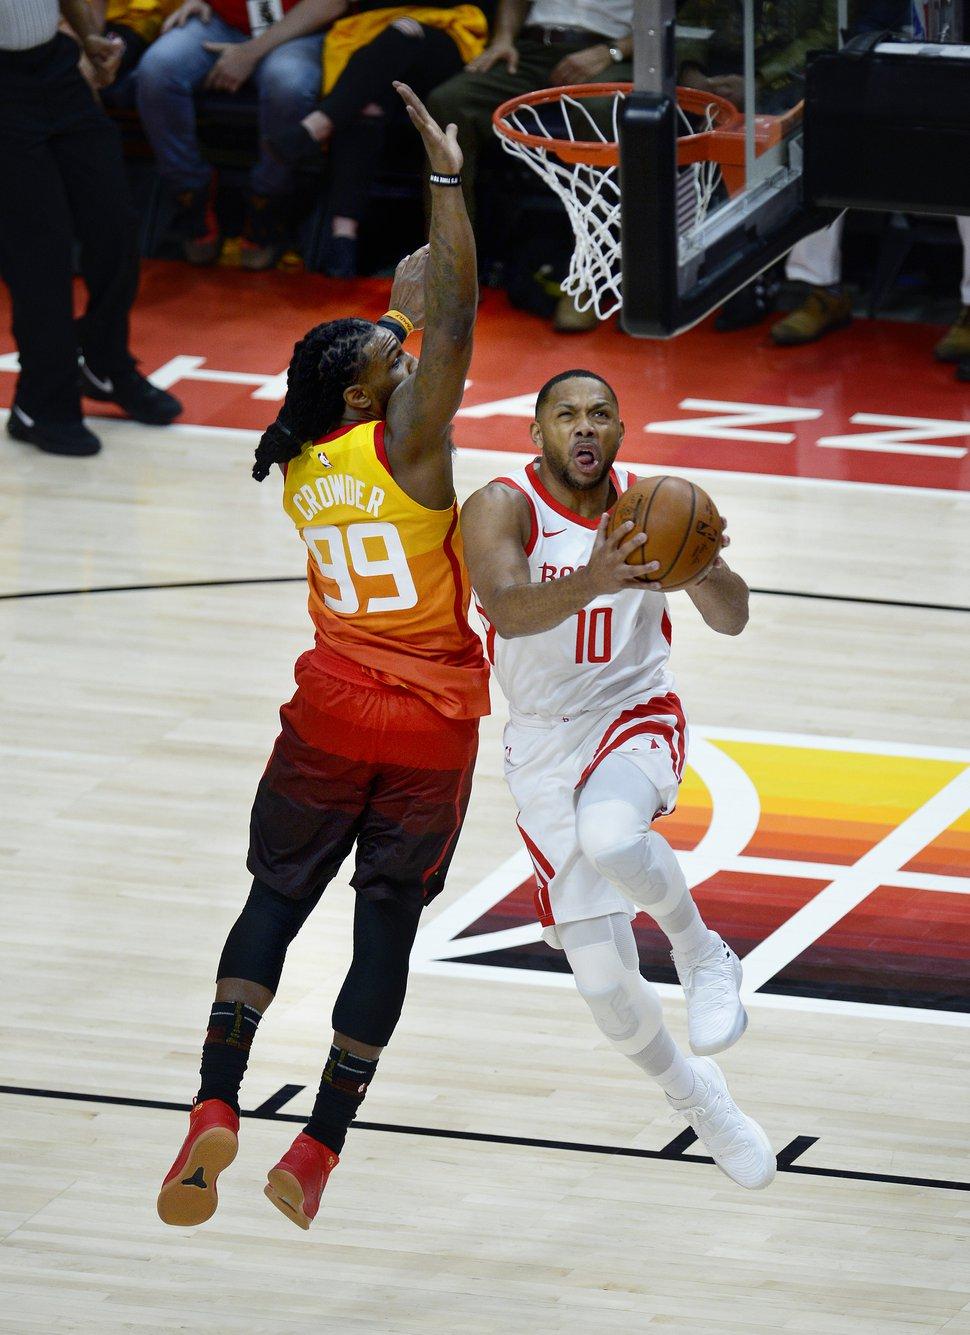 (Scott Sommerdorf | The Salt Lake Tribune) Utah Jazz forward Jae Crowder (99) defends Houston Rockets guard Eric Gordon (10) during first half play. The Houston Rockets led the Utah Jazz 70-40 at the half of game 3, Friday, May 4, 2018.